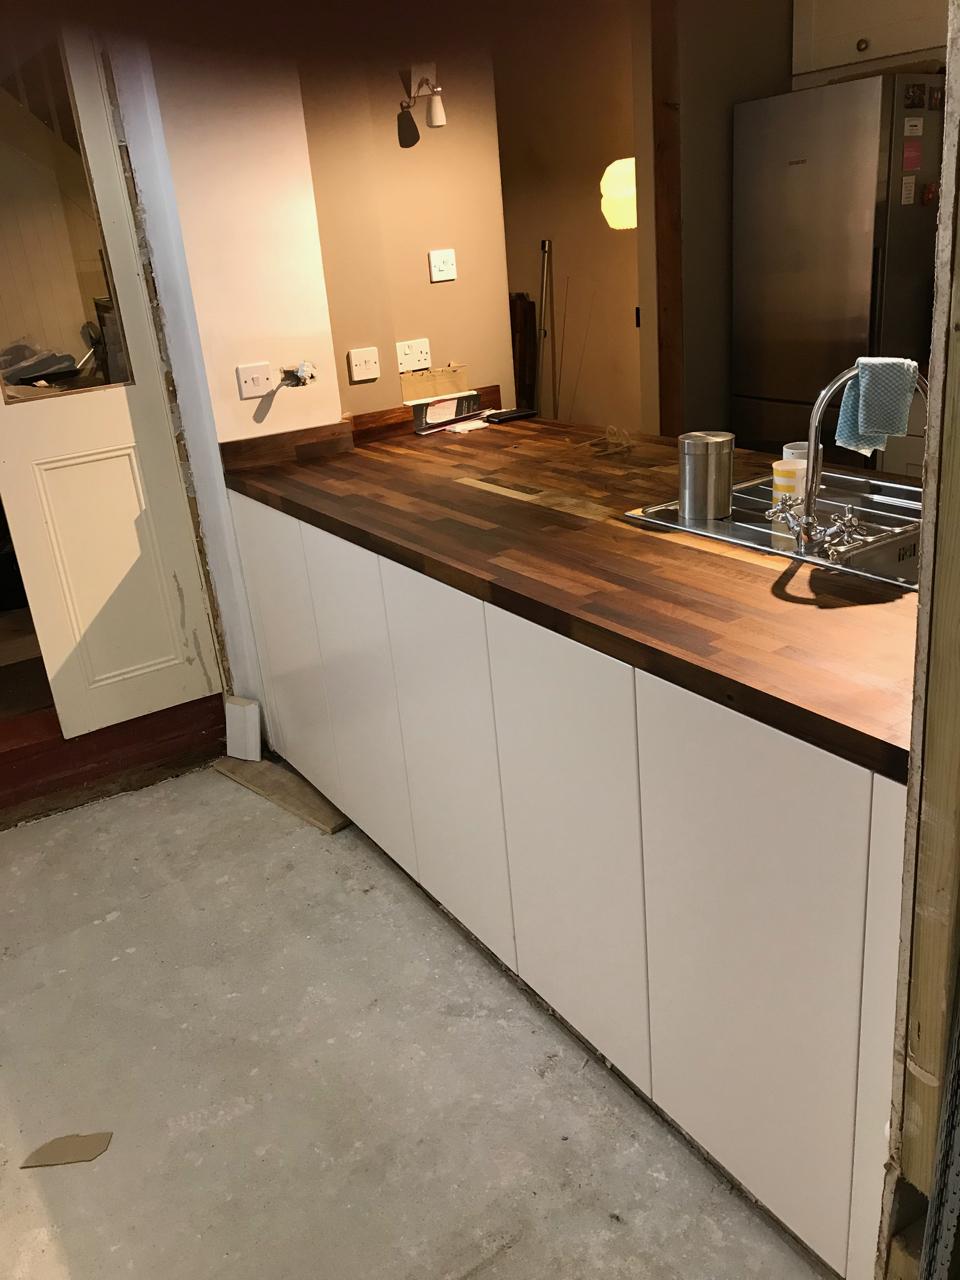 New walnut worktop and units